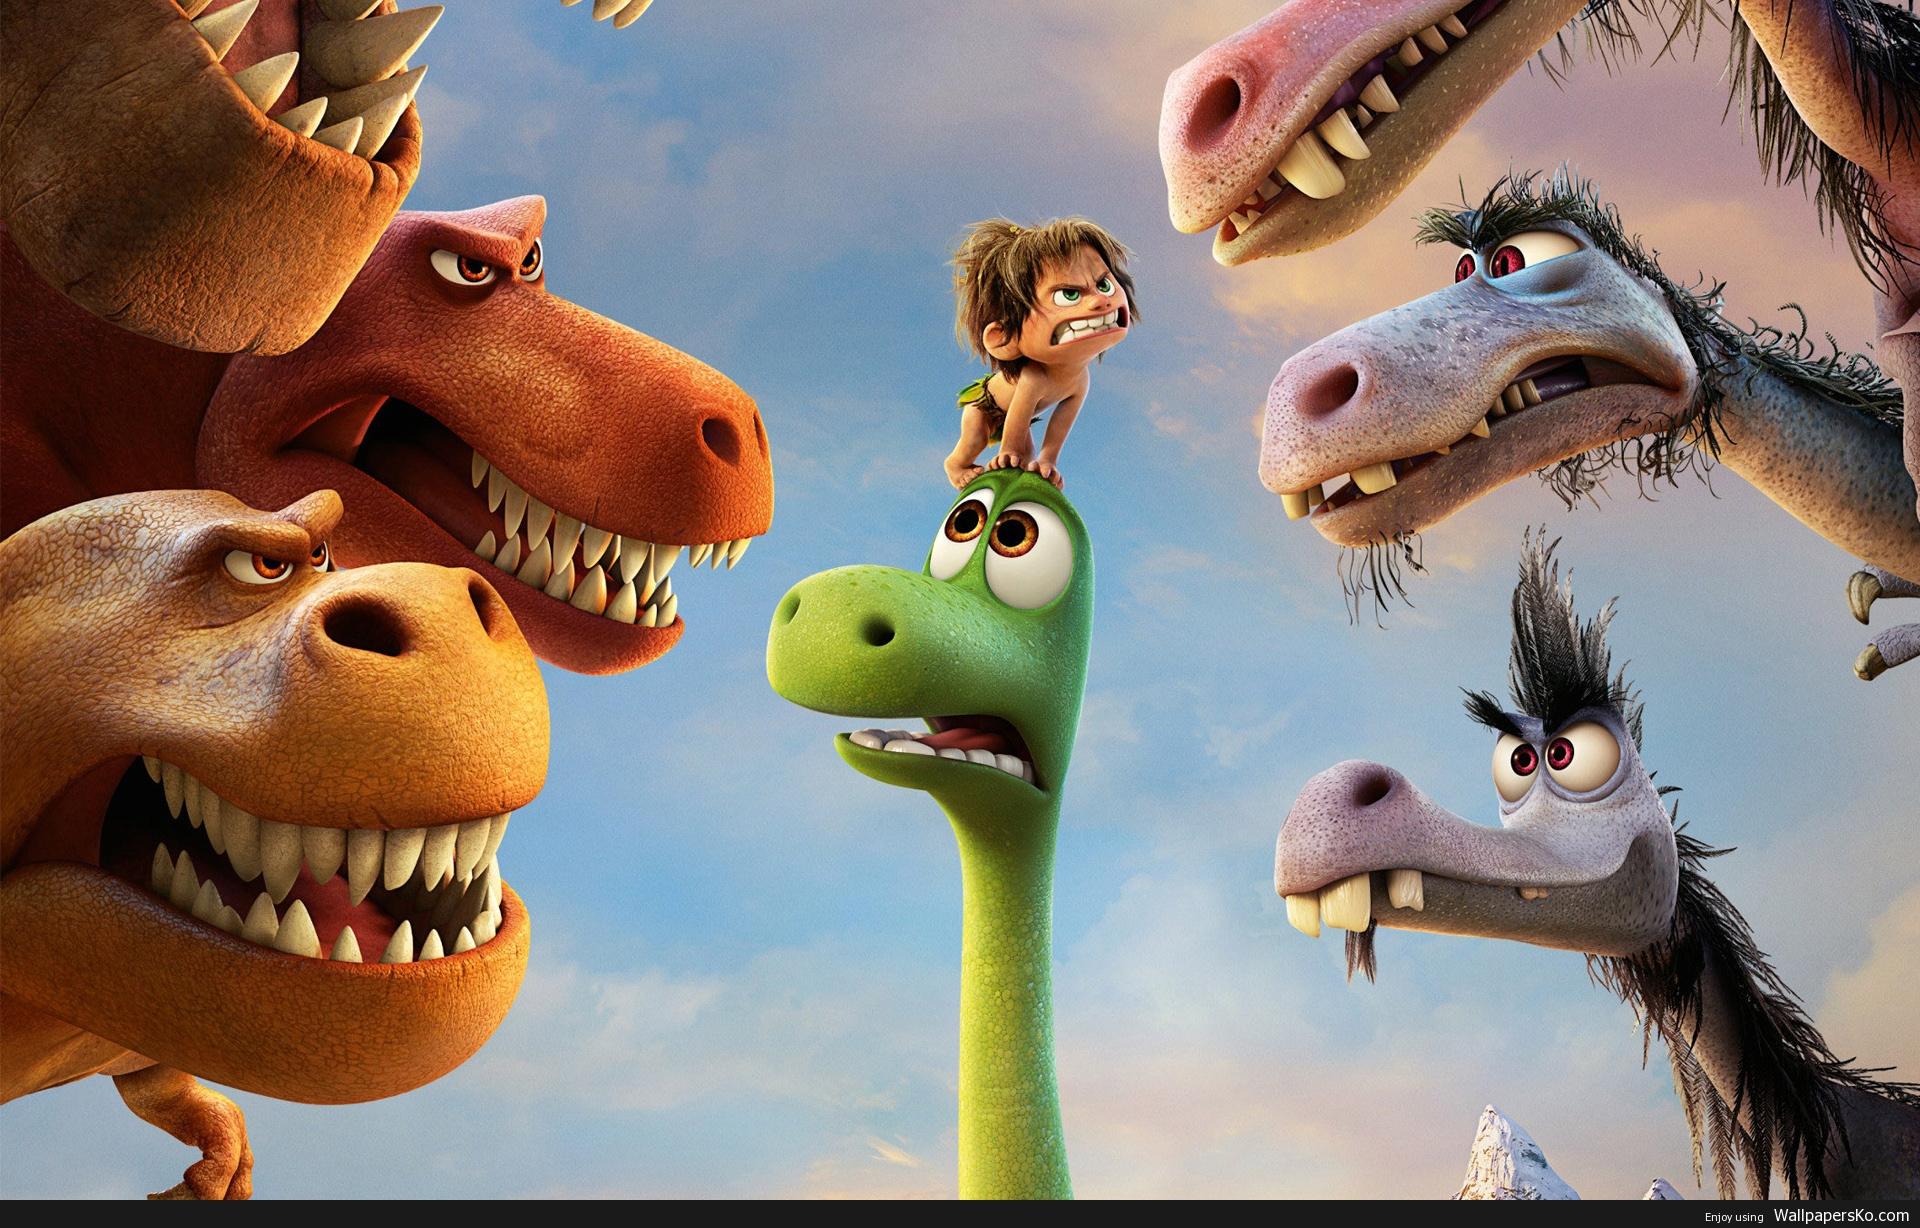 the good dinosaur wallpapers